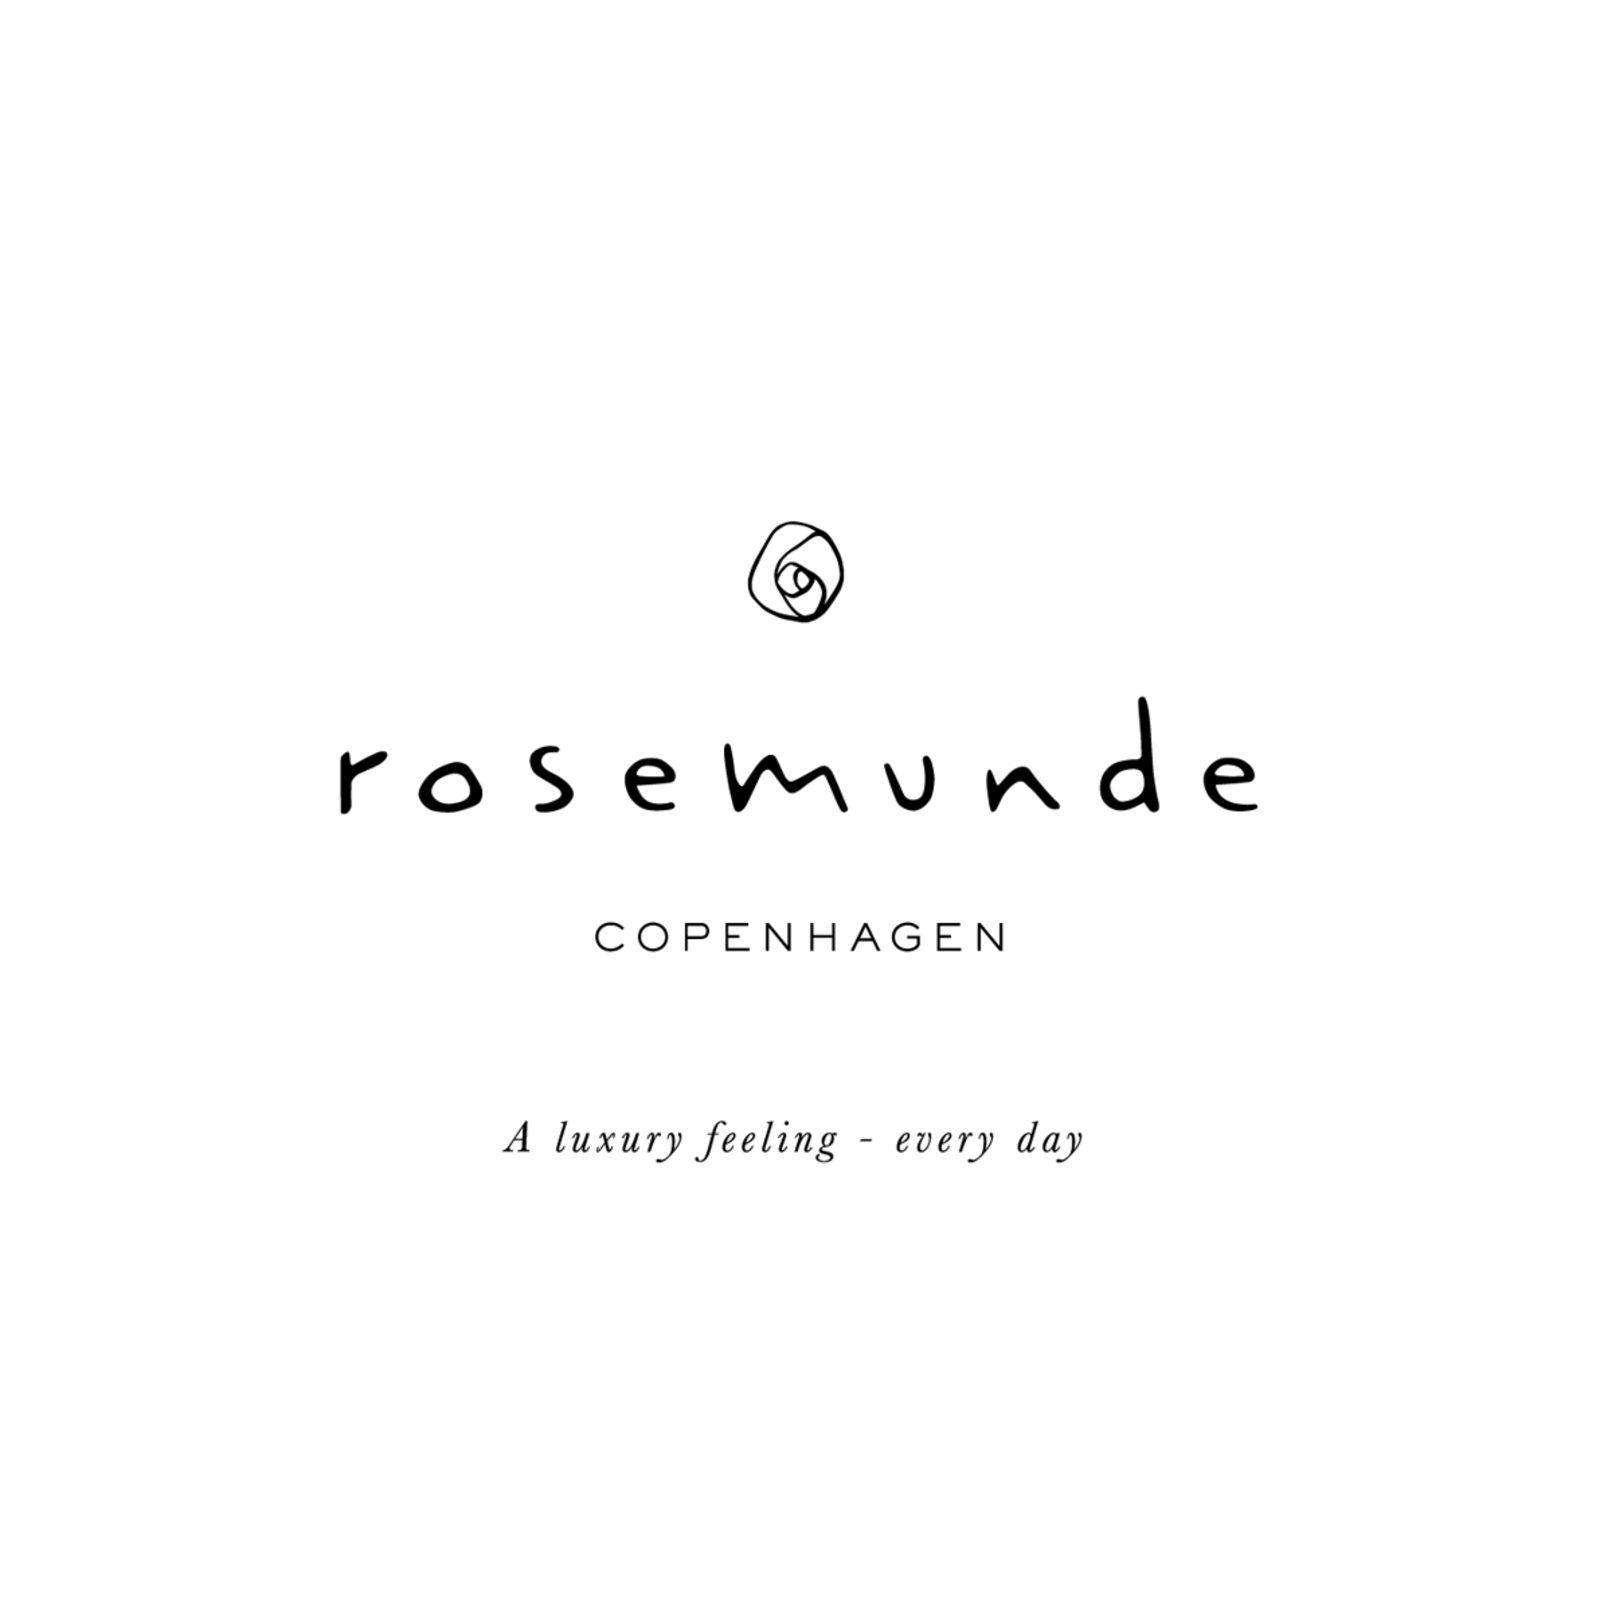 Rosemunde (Bild 1)